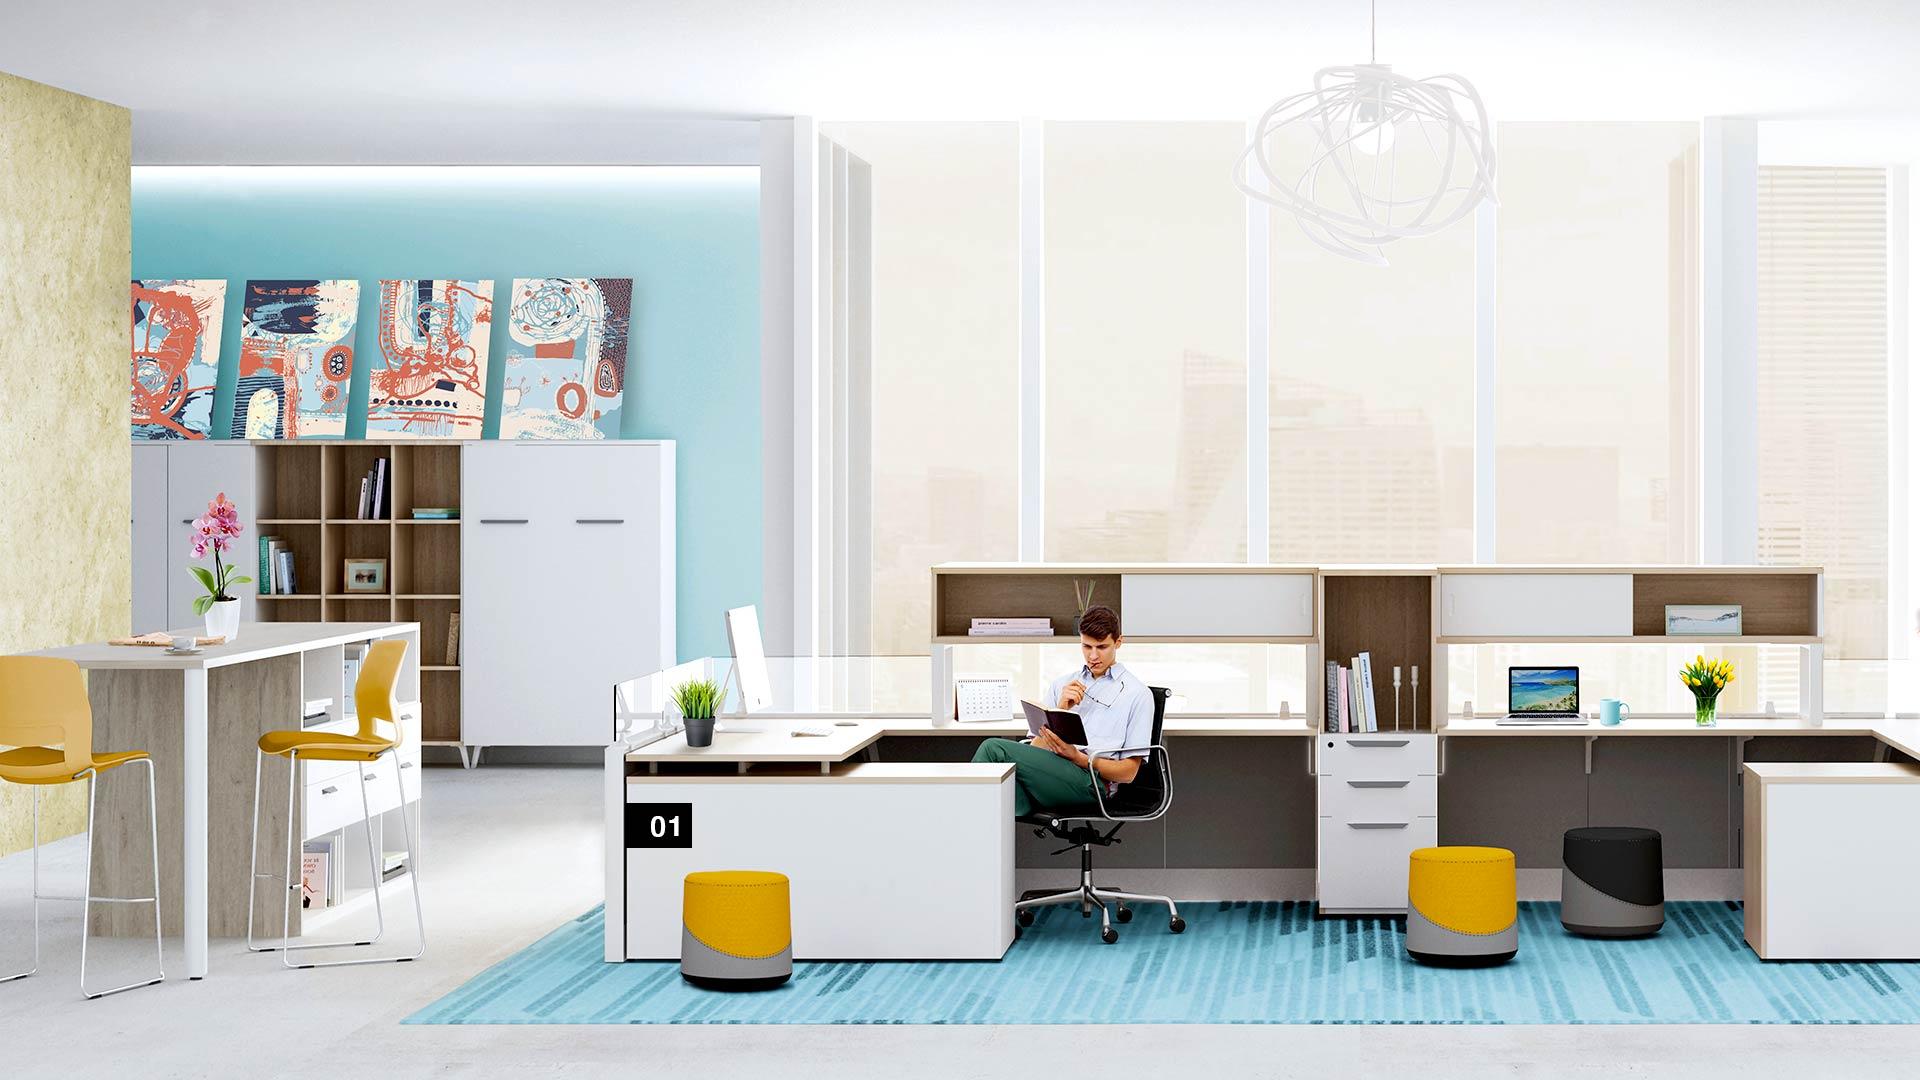 open-plan-benching-friant-dash-revitalize-4